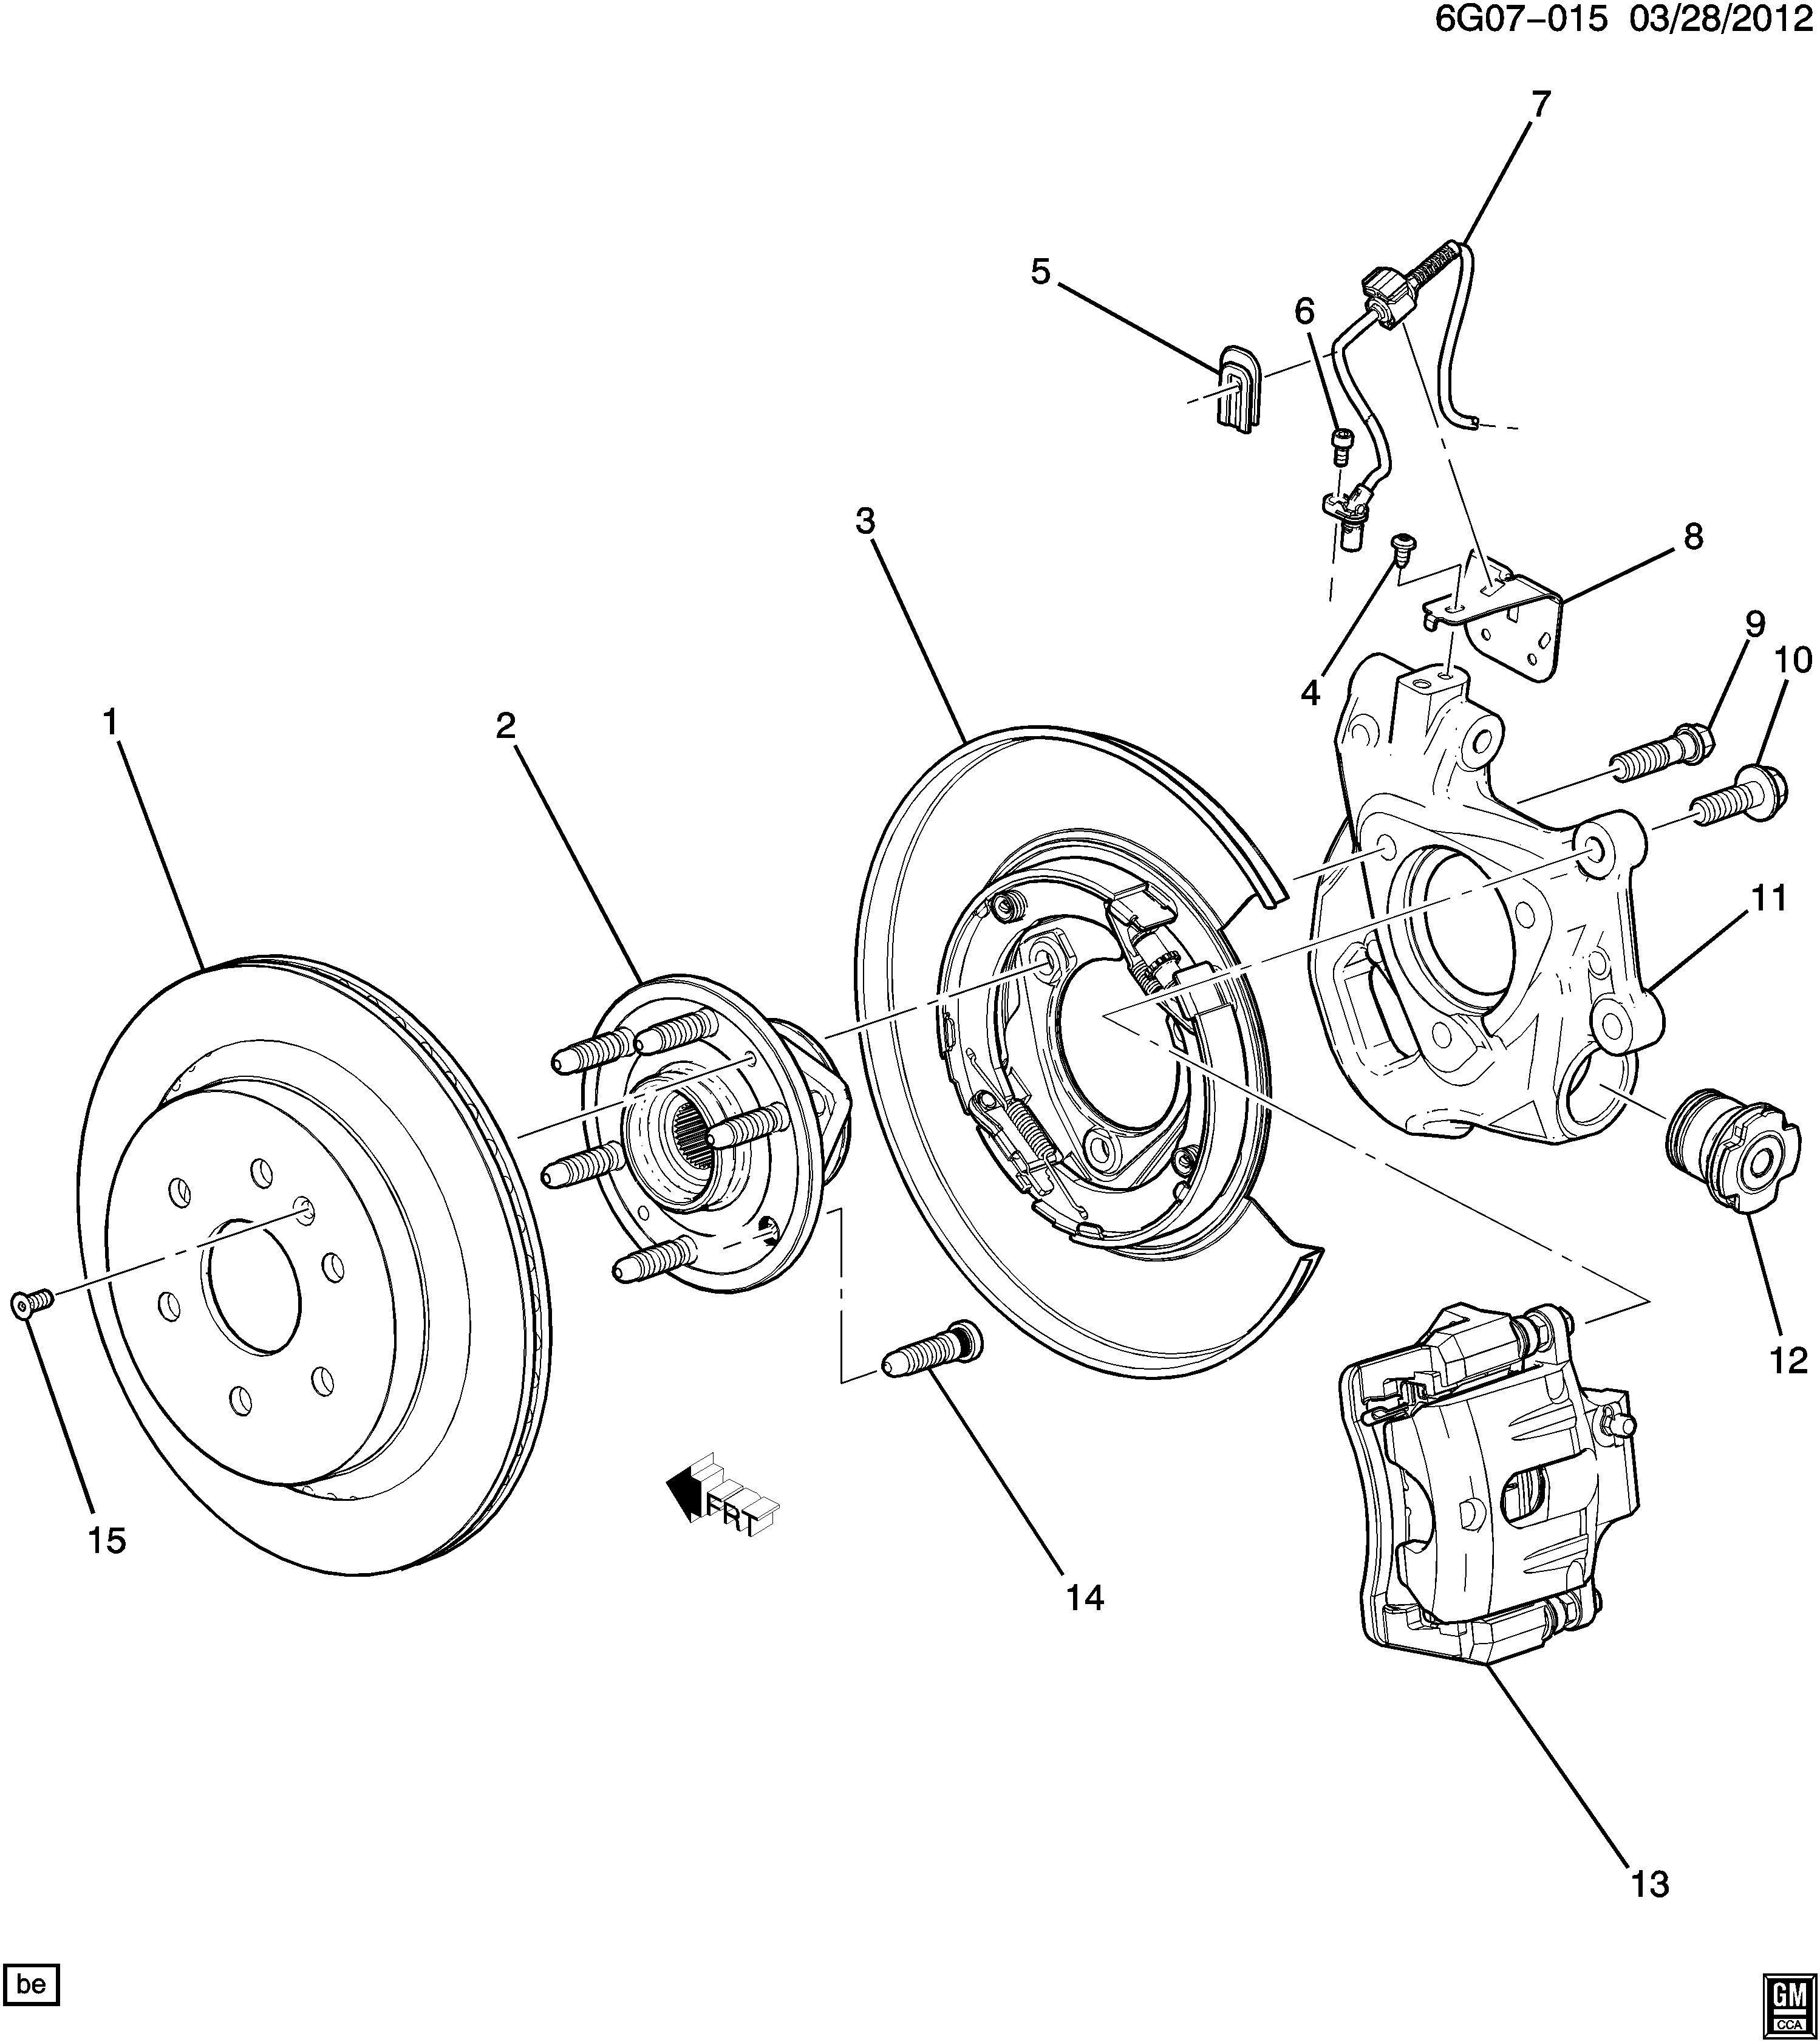 Chevrolet Sonic Bolt Adh Kitbushing